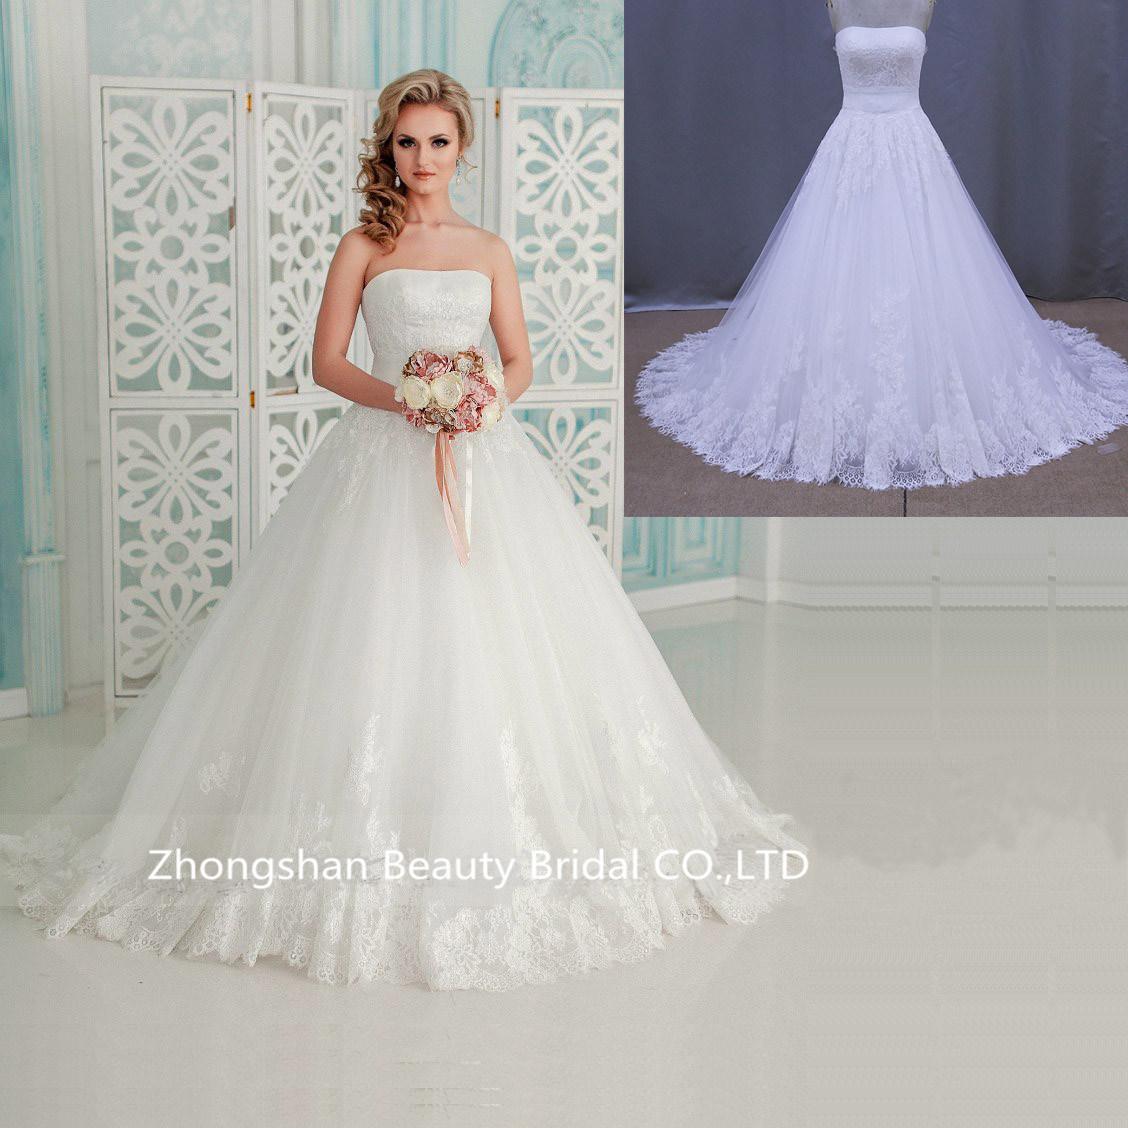 Latest wedding dresses com Your wedding memories photo